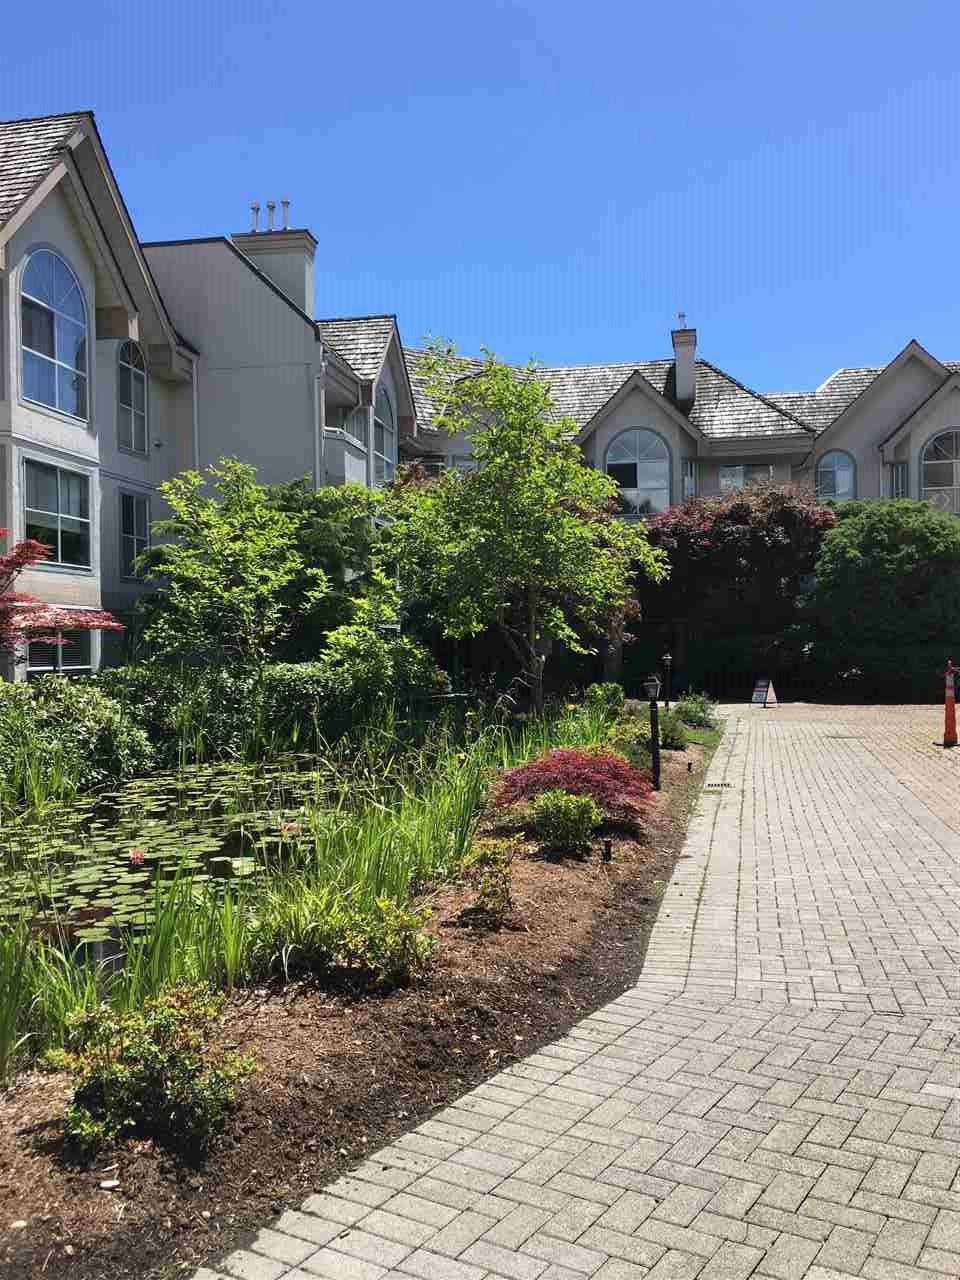 Sold: 120 - 7151 121 Street, Surrey, BC